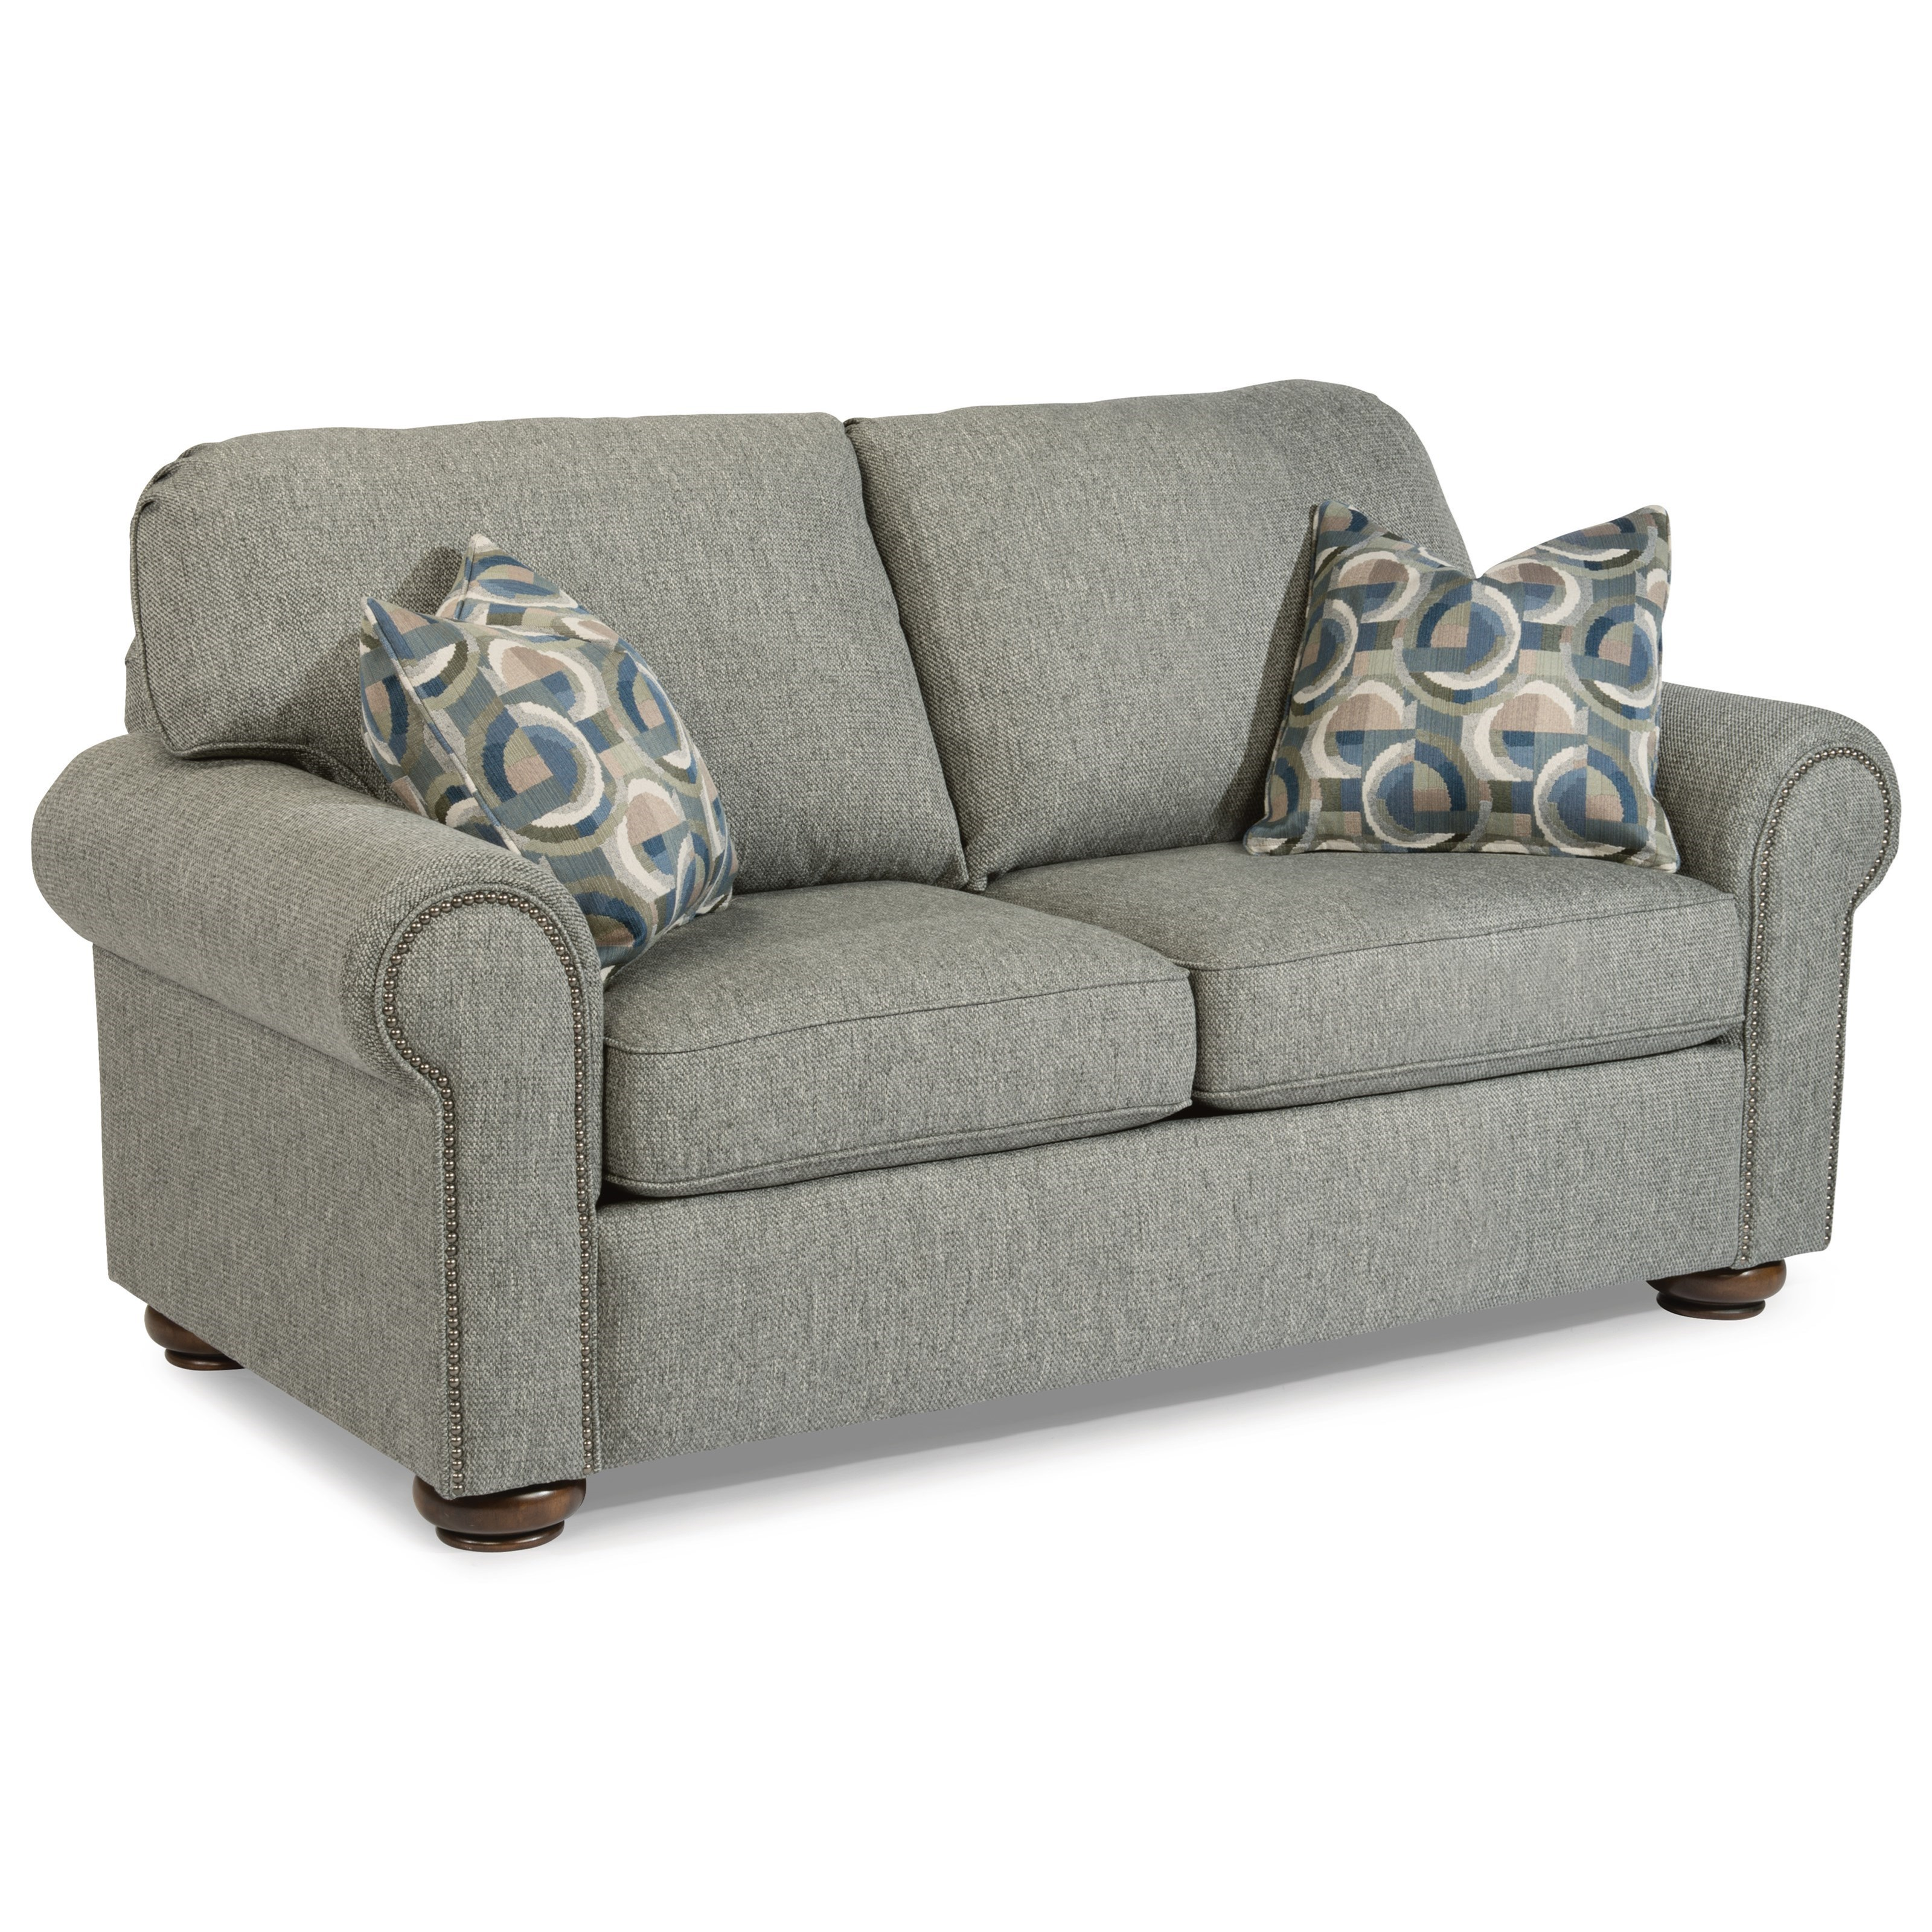 Preston Loveseat  by Flexsteel at Steger's Furniture